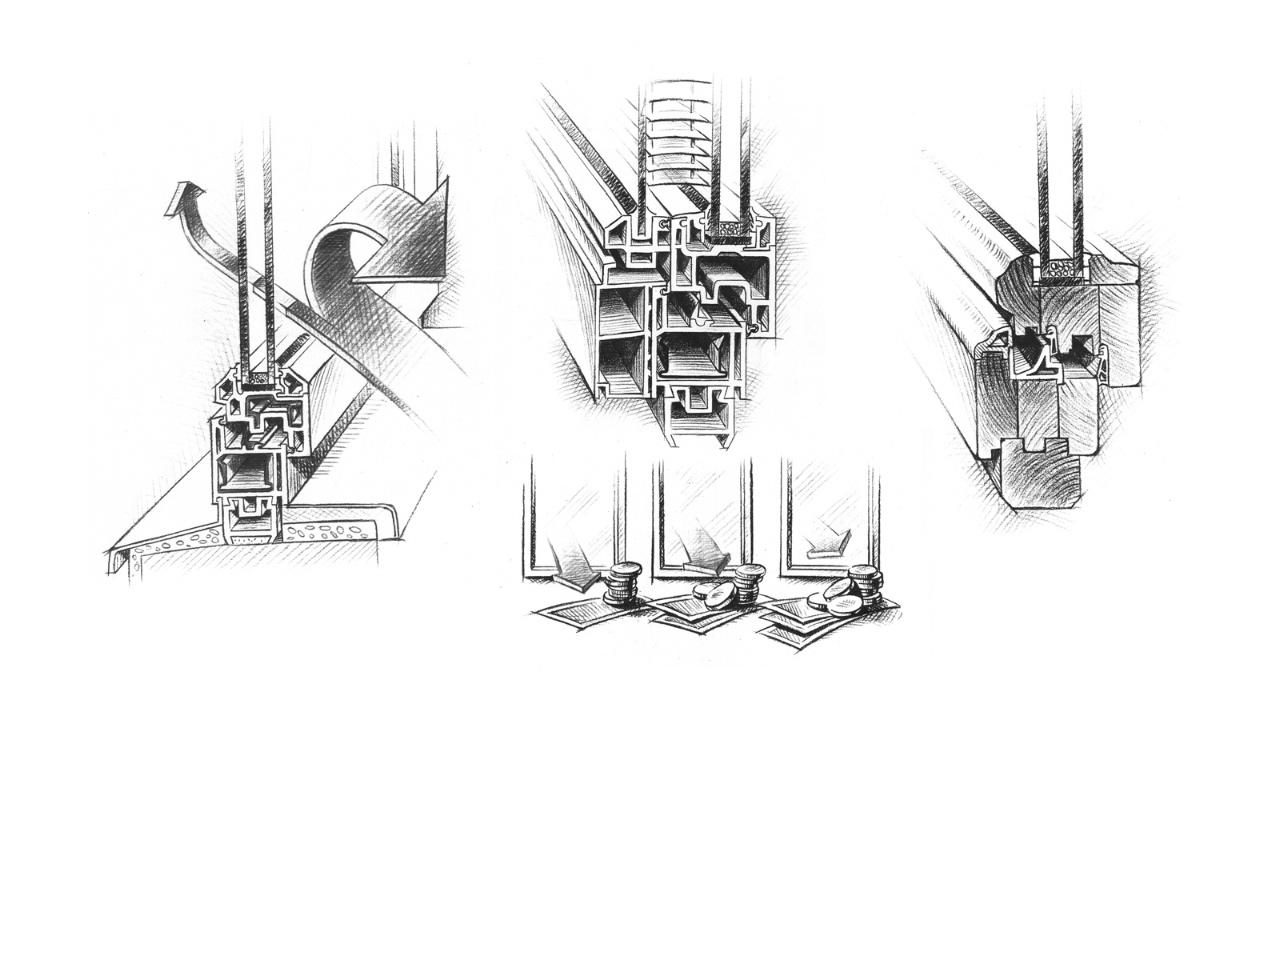 VANDEELENFred-Illustrations-TECHNIQUES INFOGRAPHIE-2886